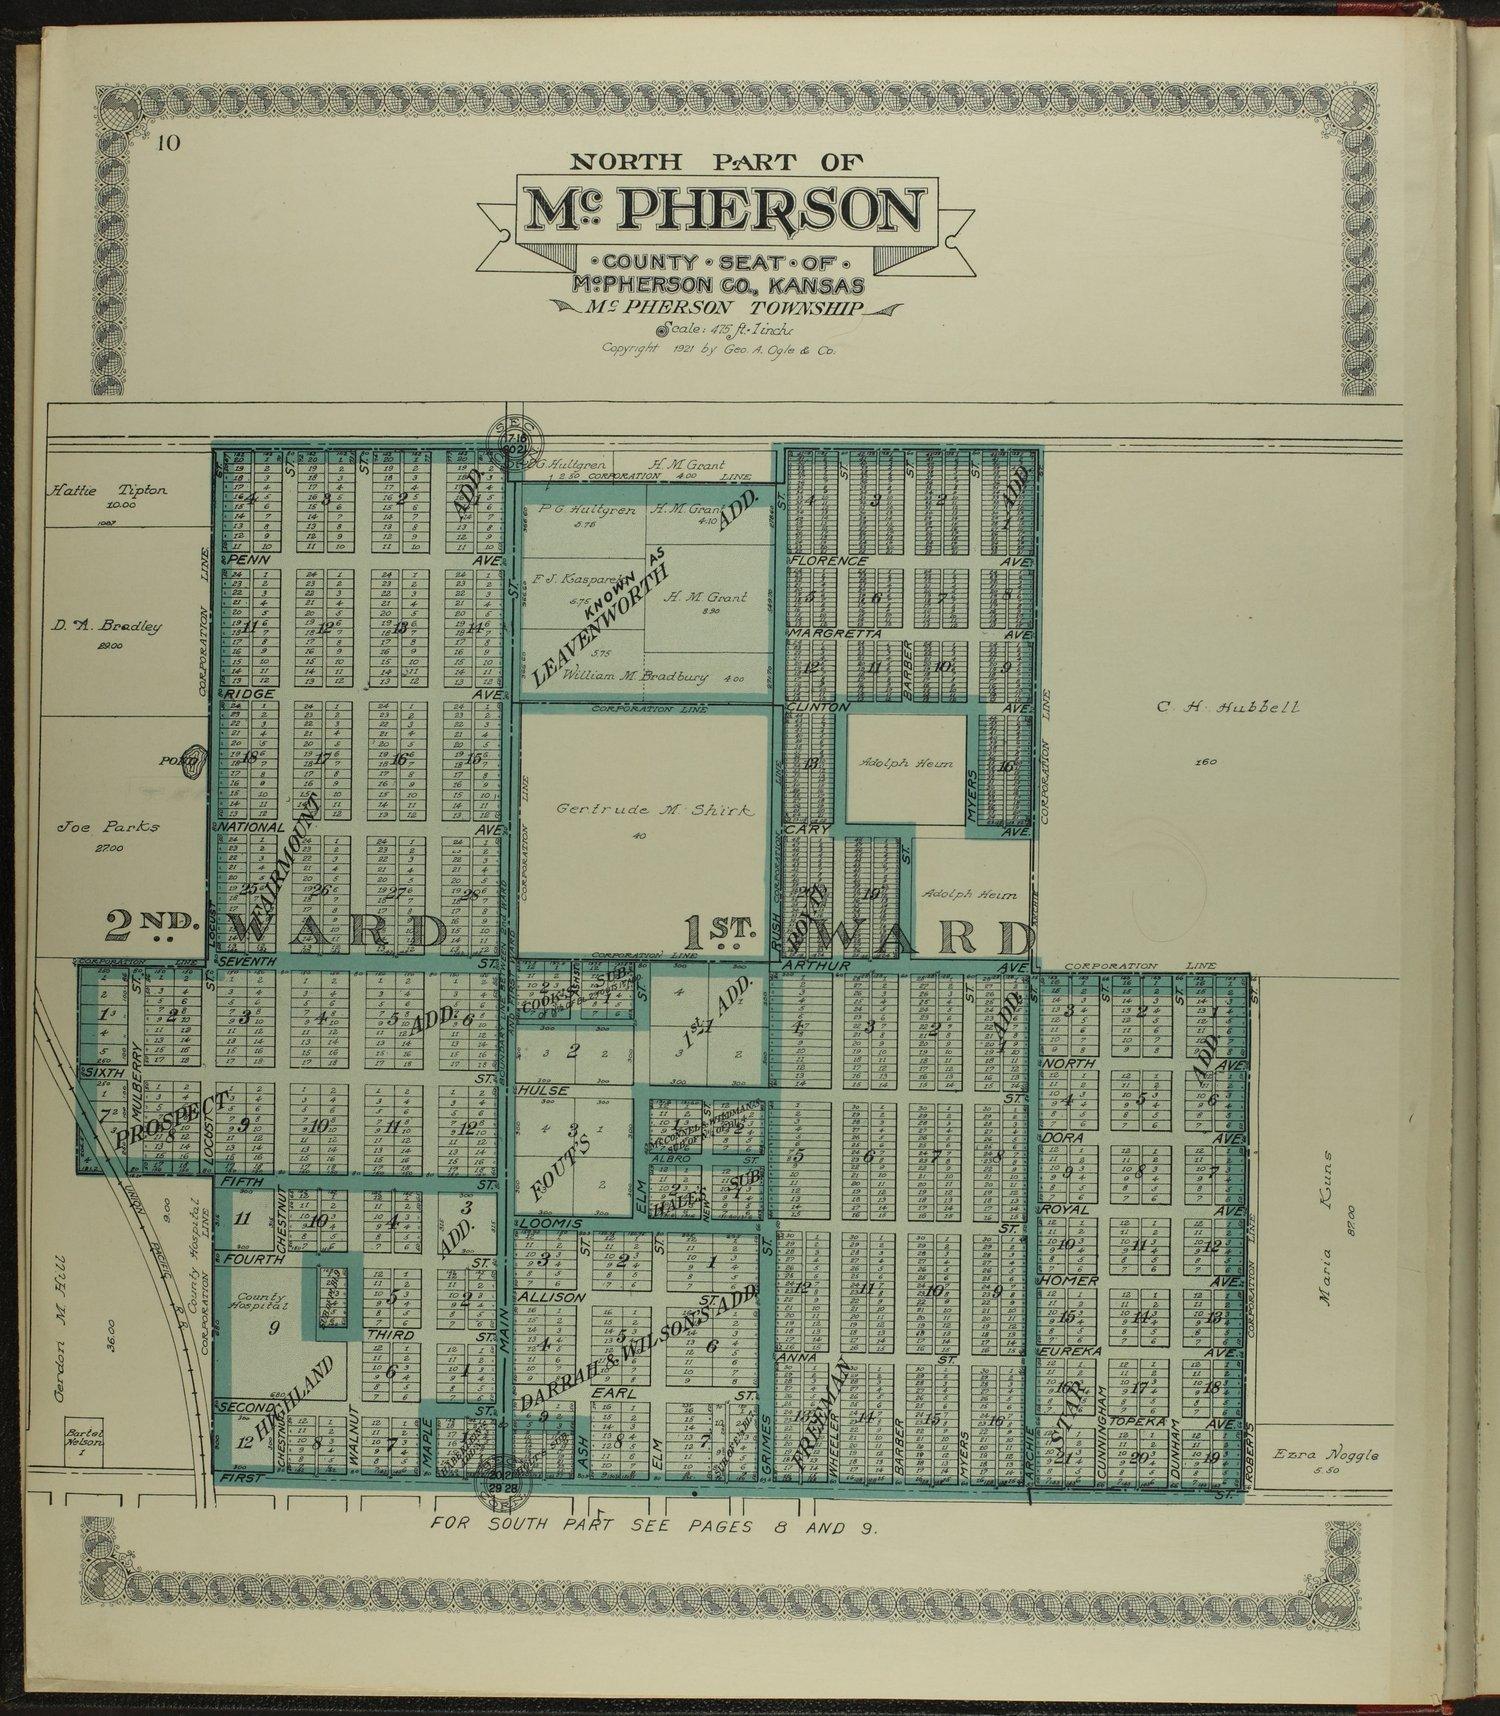 Standard atlas of McPherson County, Kansas - 10